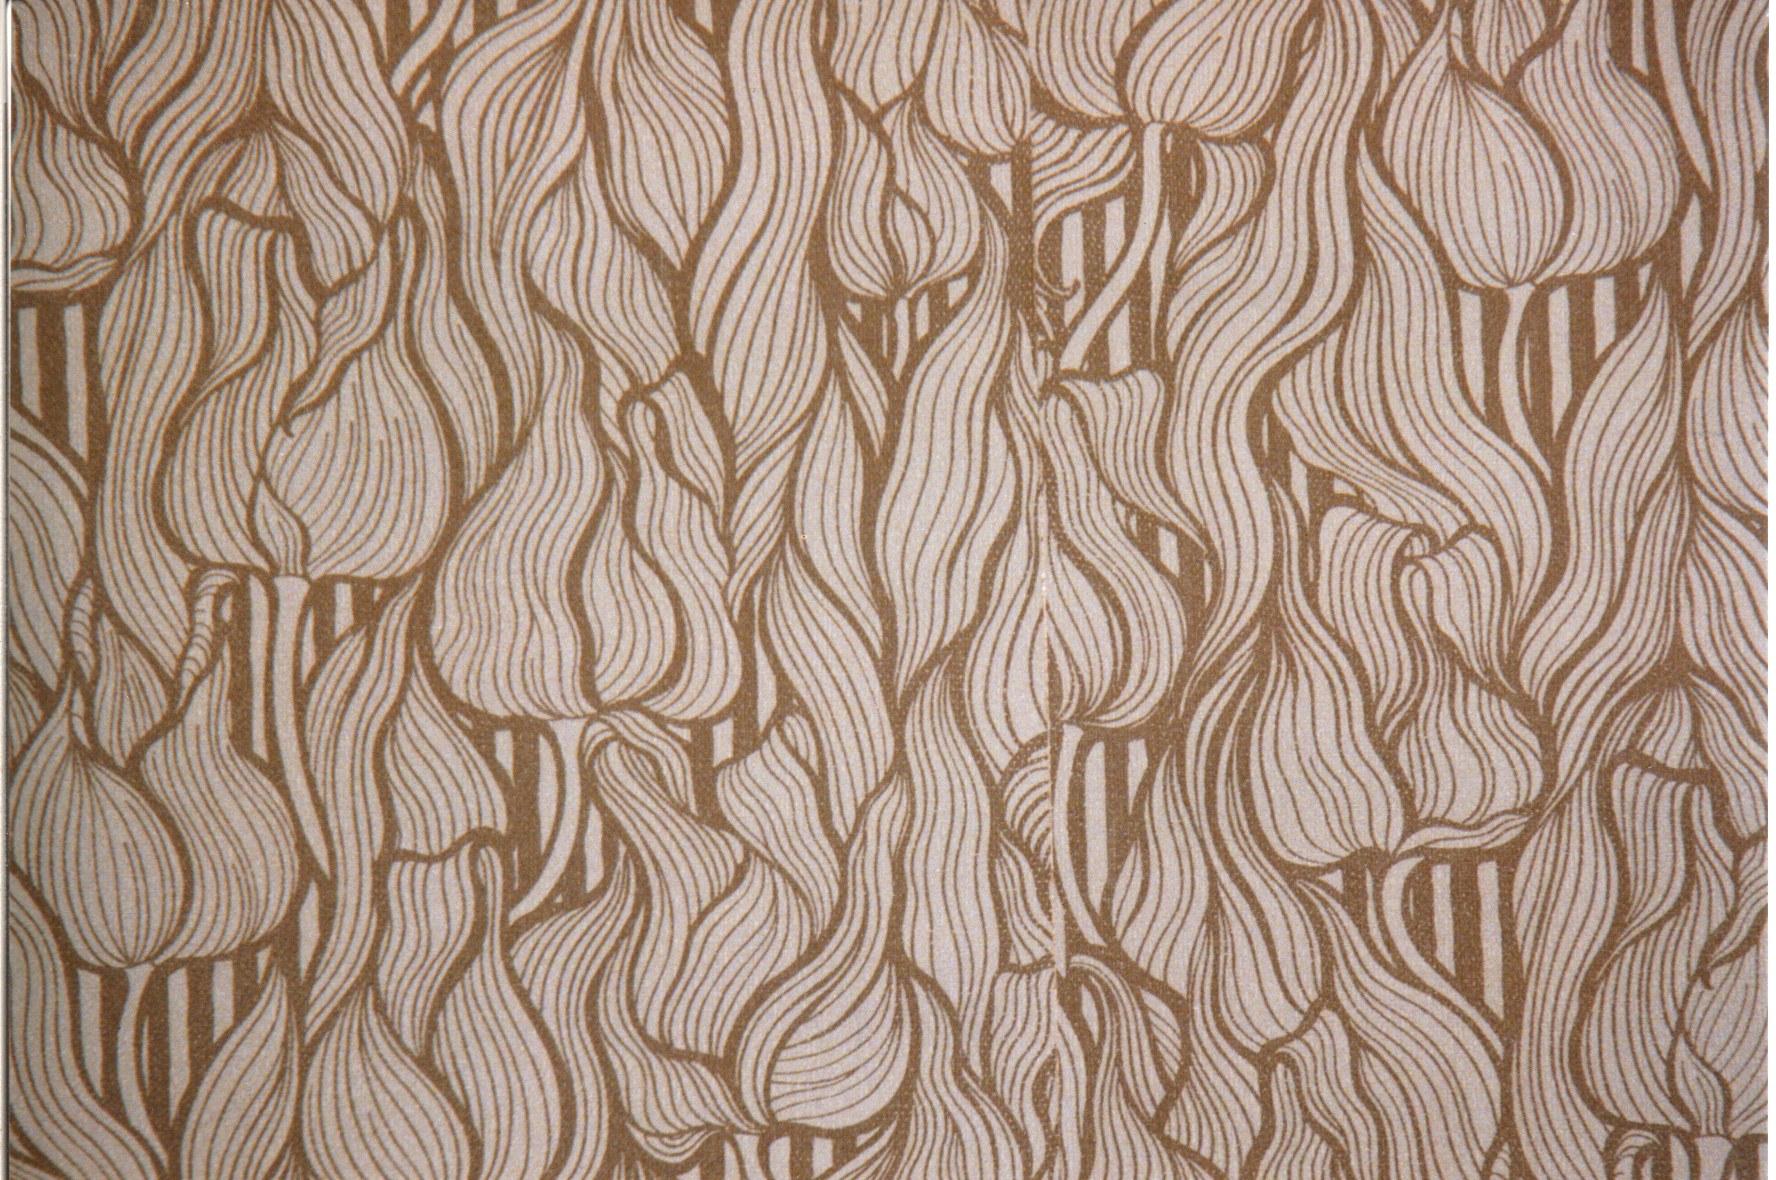 Texture paints designs for walls